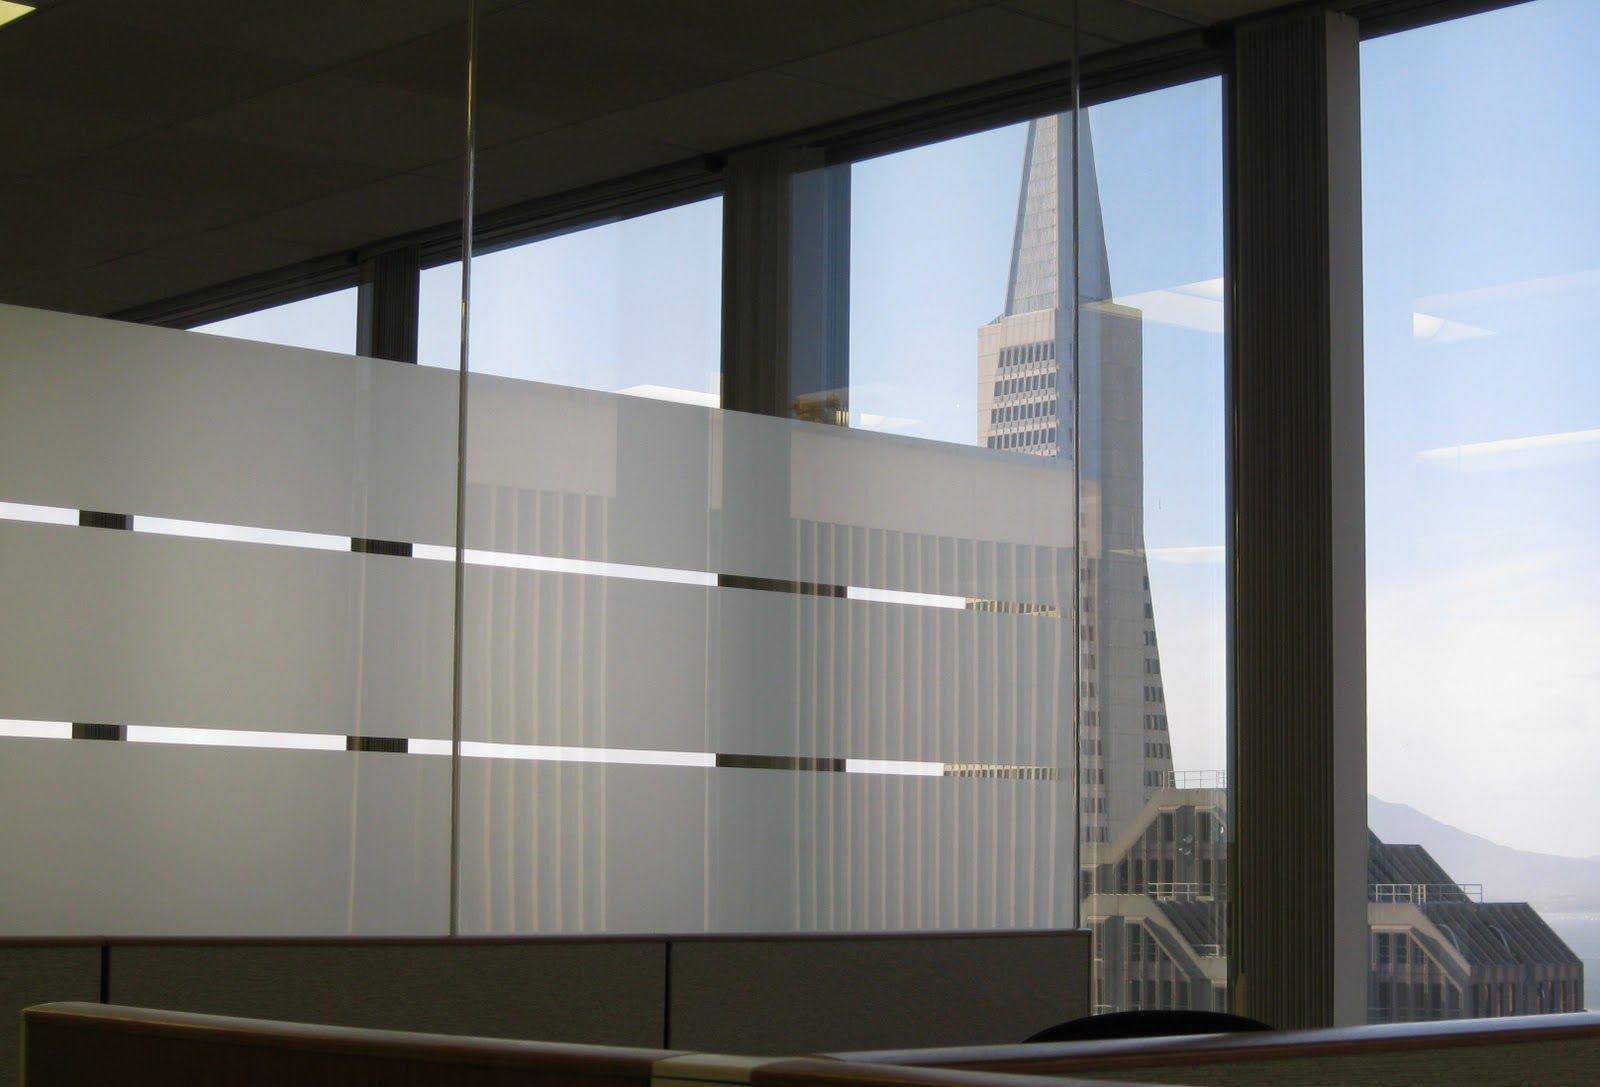 Special-Glass-Foil-for-frosted-window-film-design - Google zoeken ...